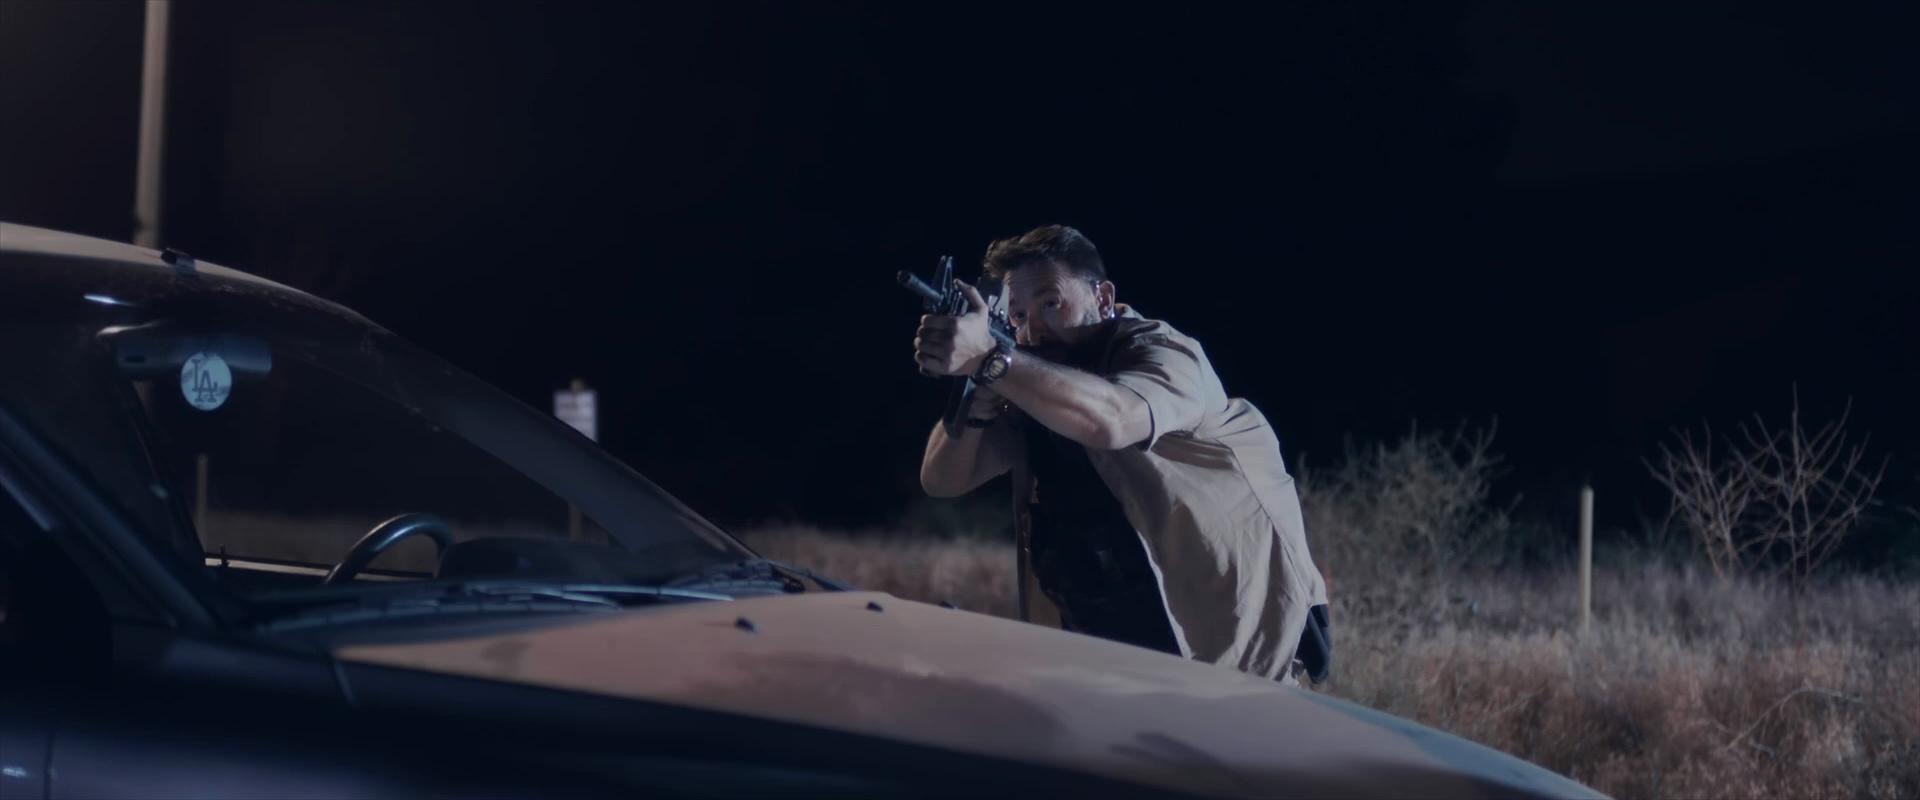 La Segunda (2020) 1080p BRRip Latino